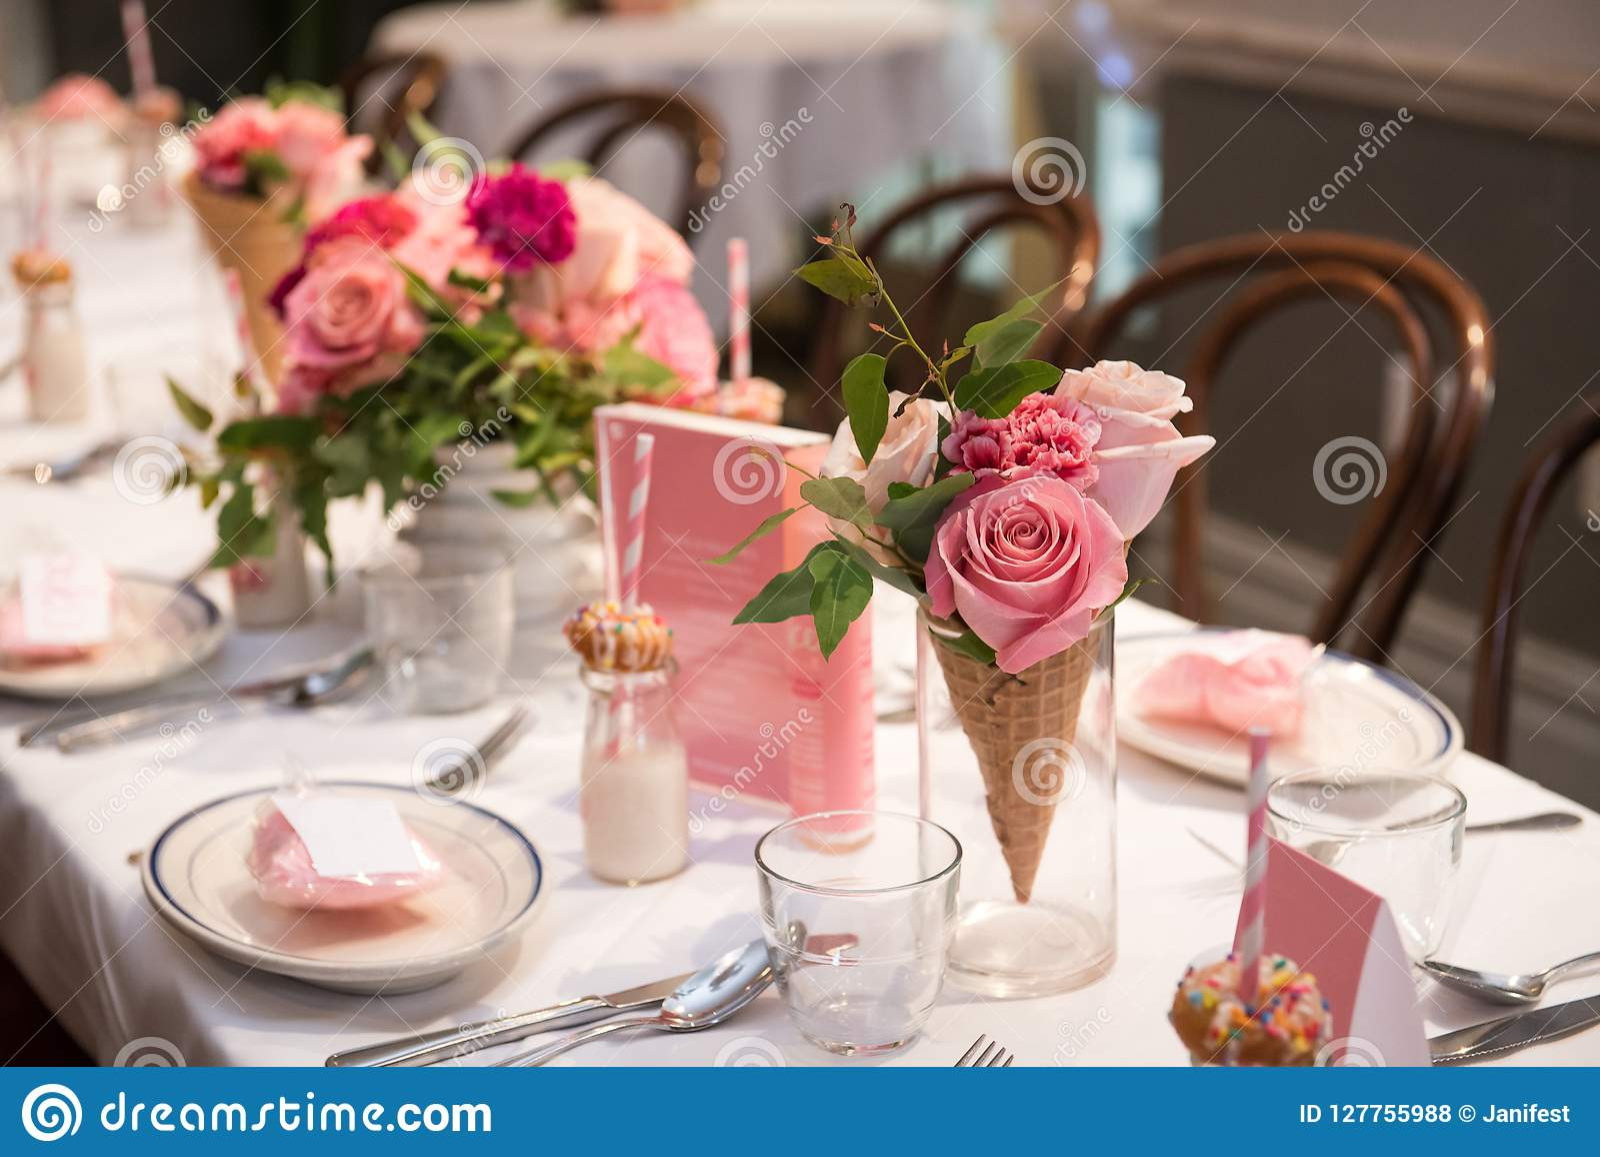 Pink Flower Design On The Served Restaurant Table For Sunday Girly